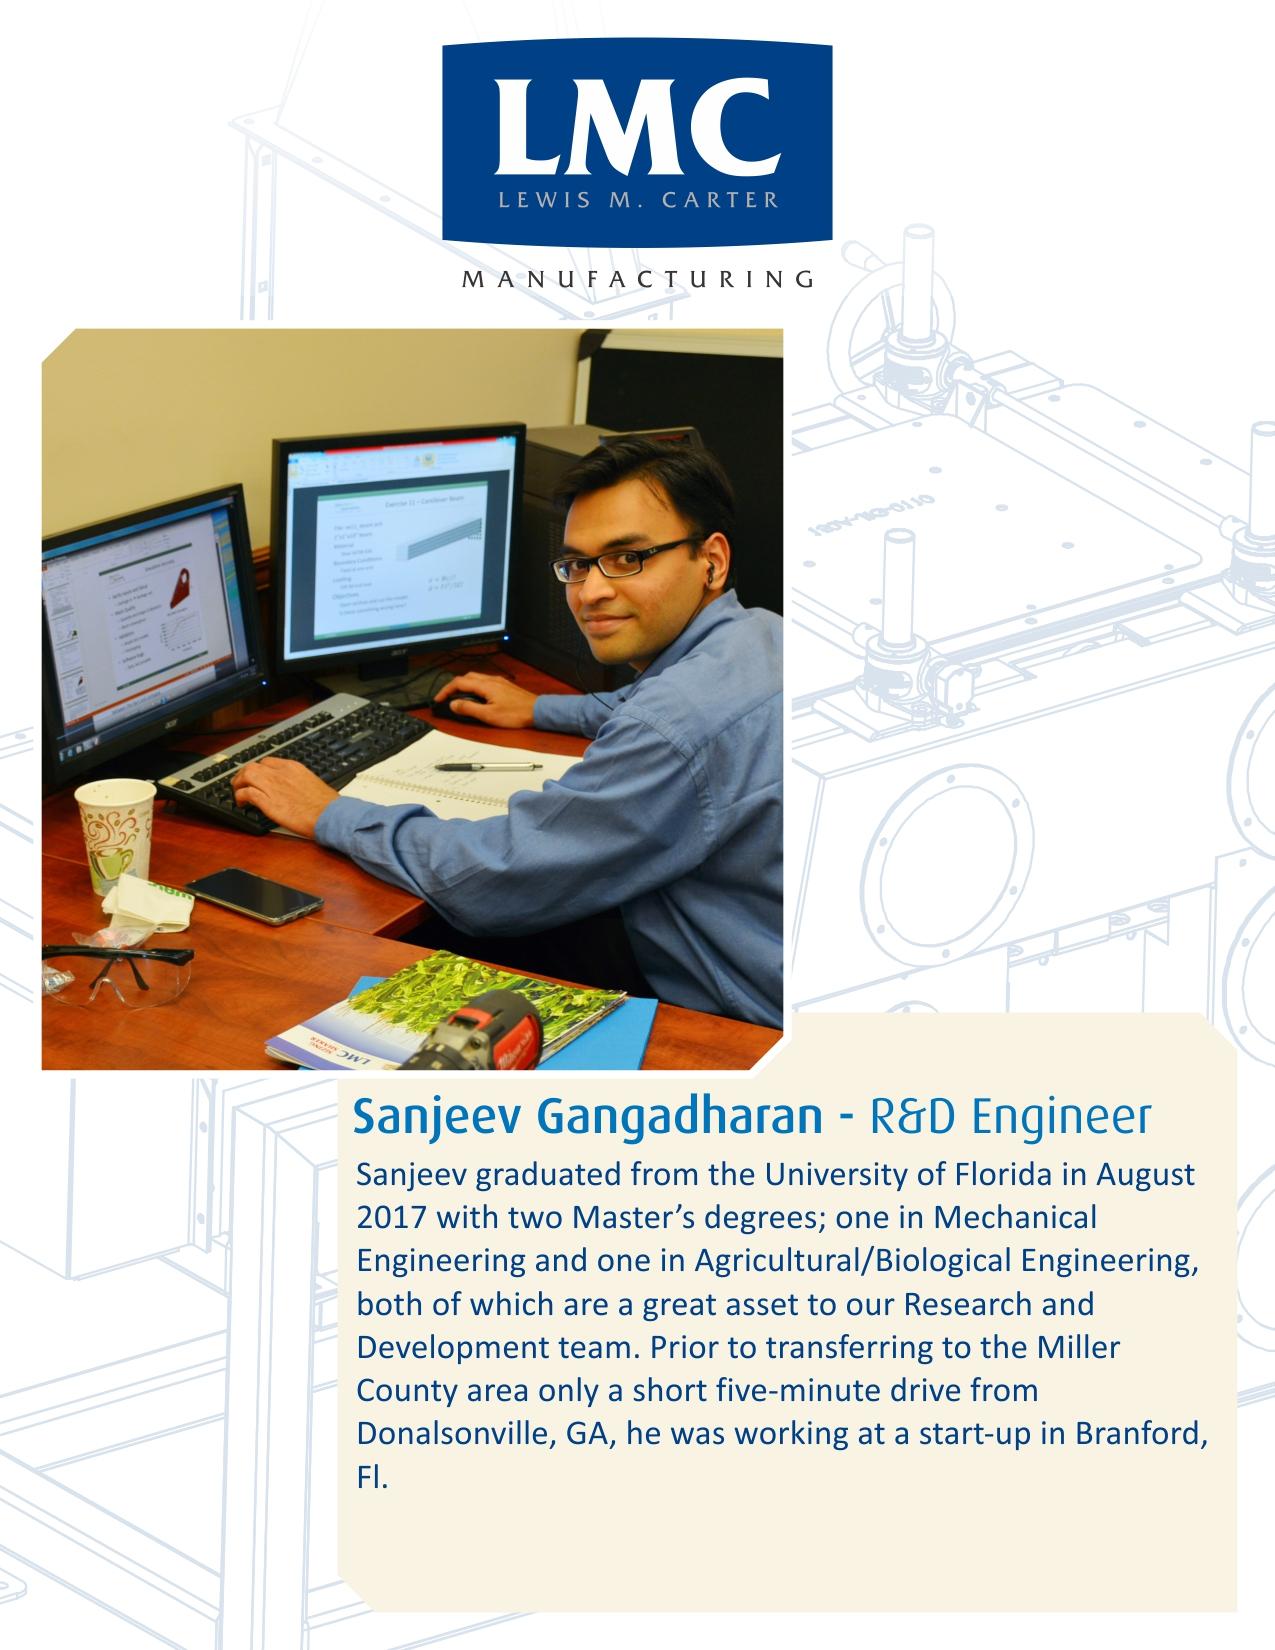 New Hire – Sanjeev Gangadharan